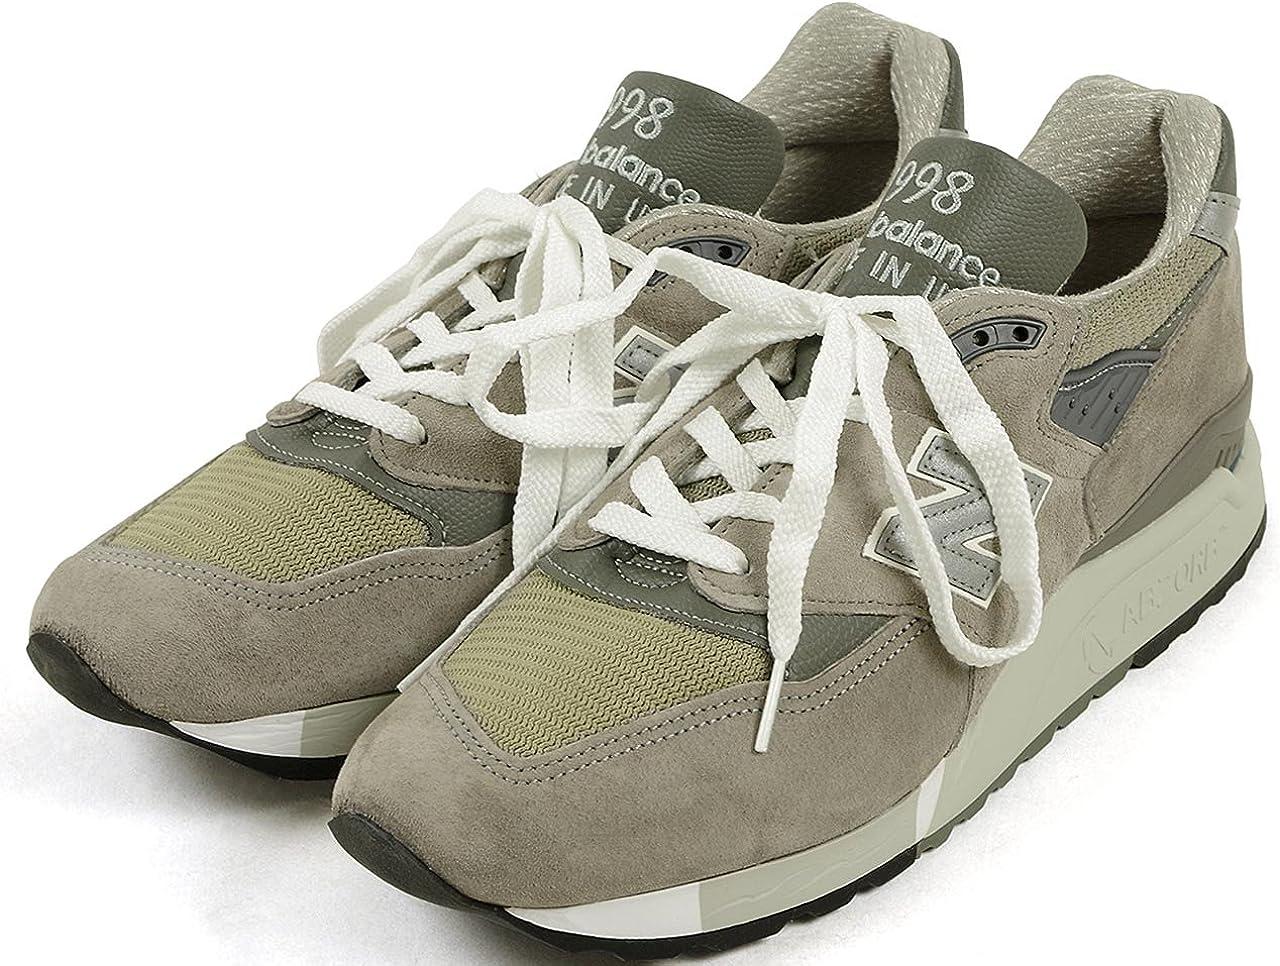 Alboroto variable Confesión  Amazon.co.jp: New Balance M998 Gray (MADE IN USA) - grey: Shoes & Bags